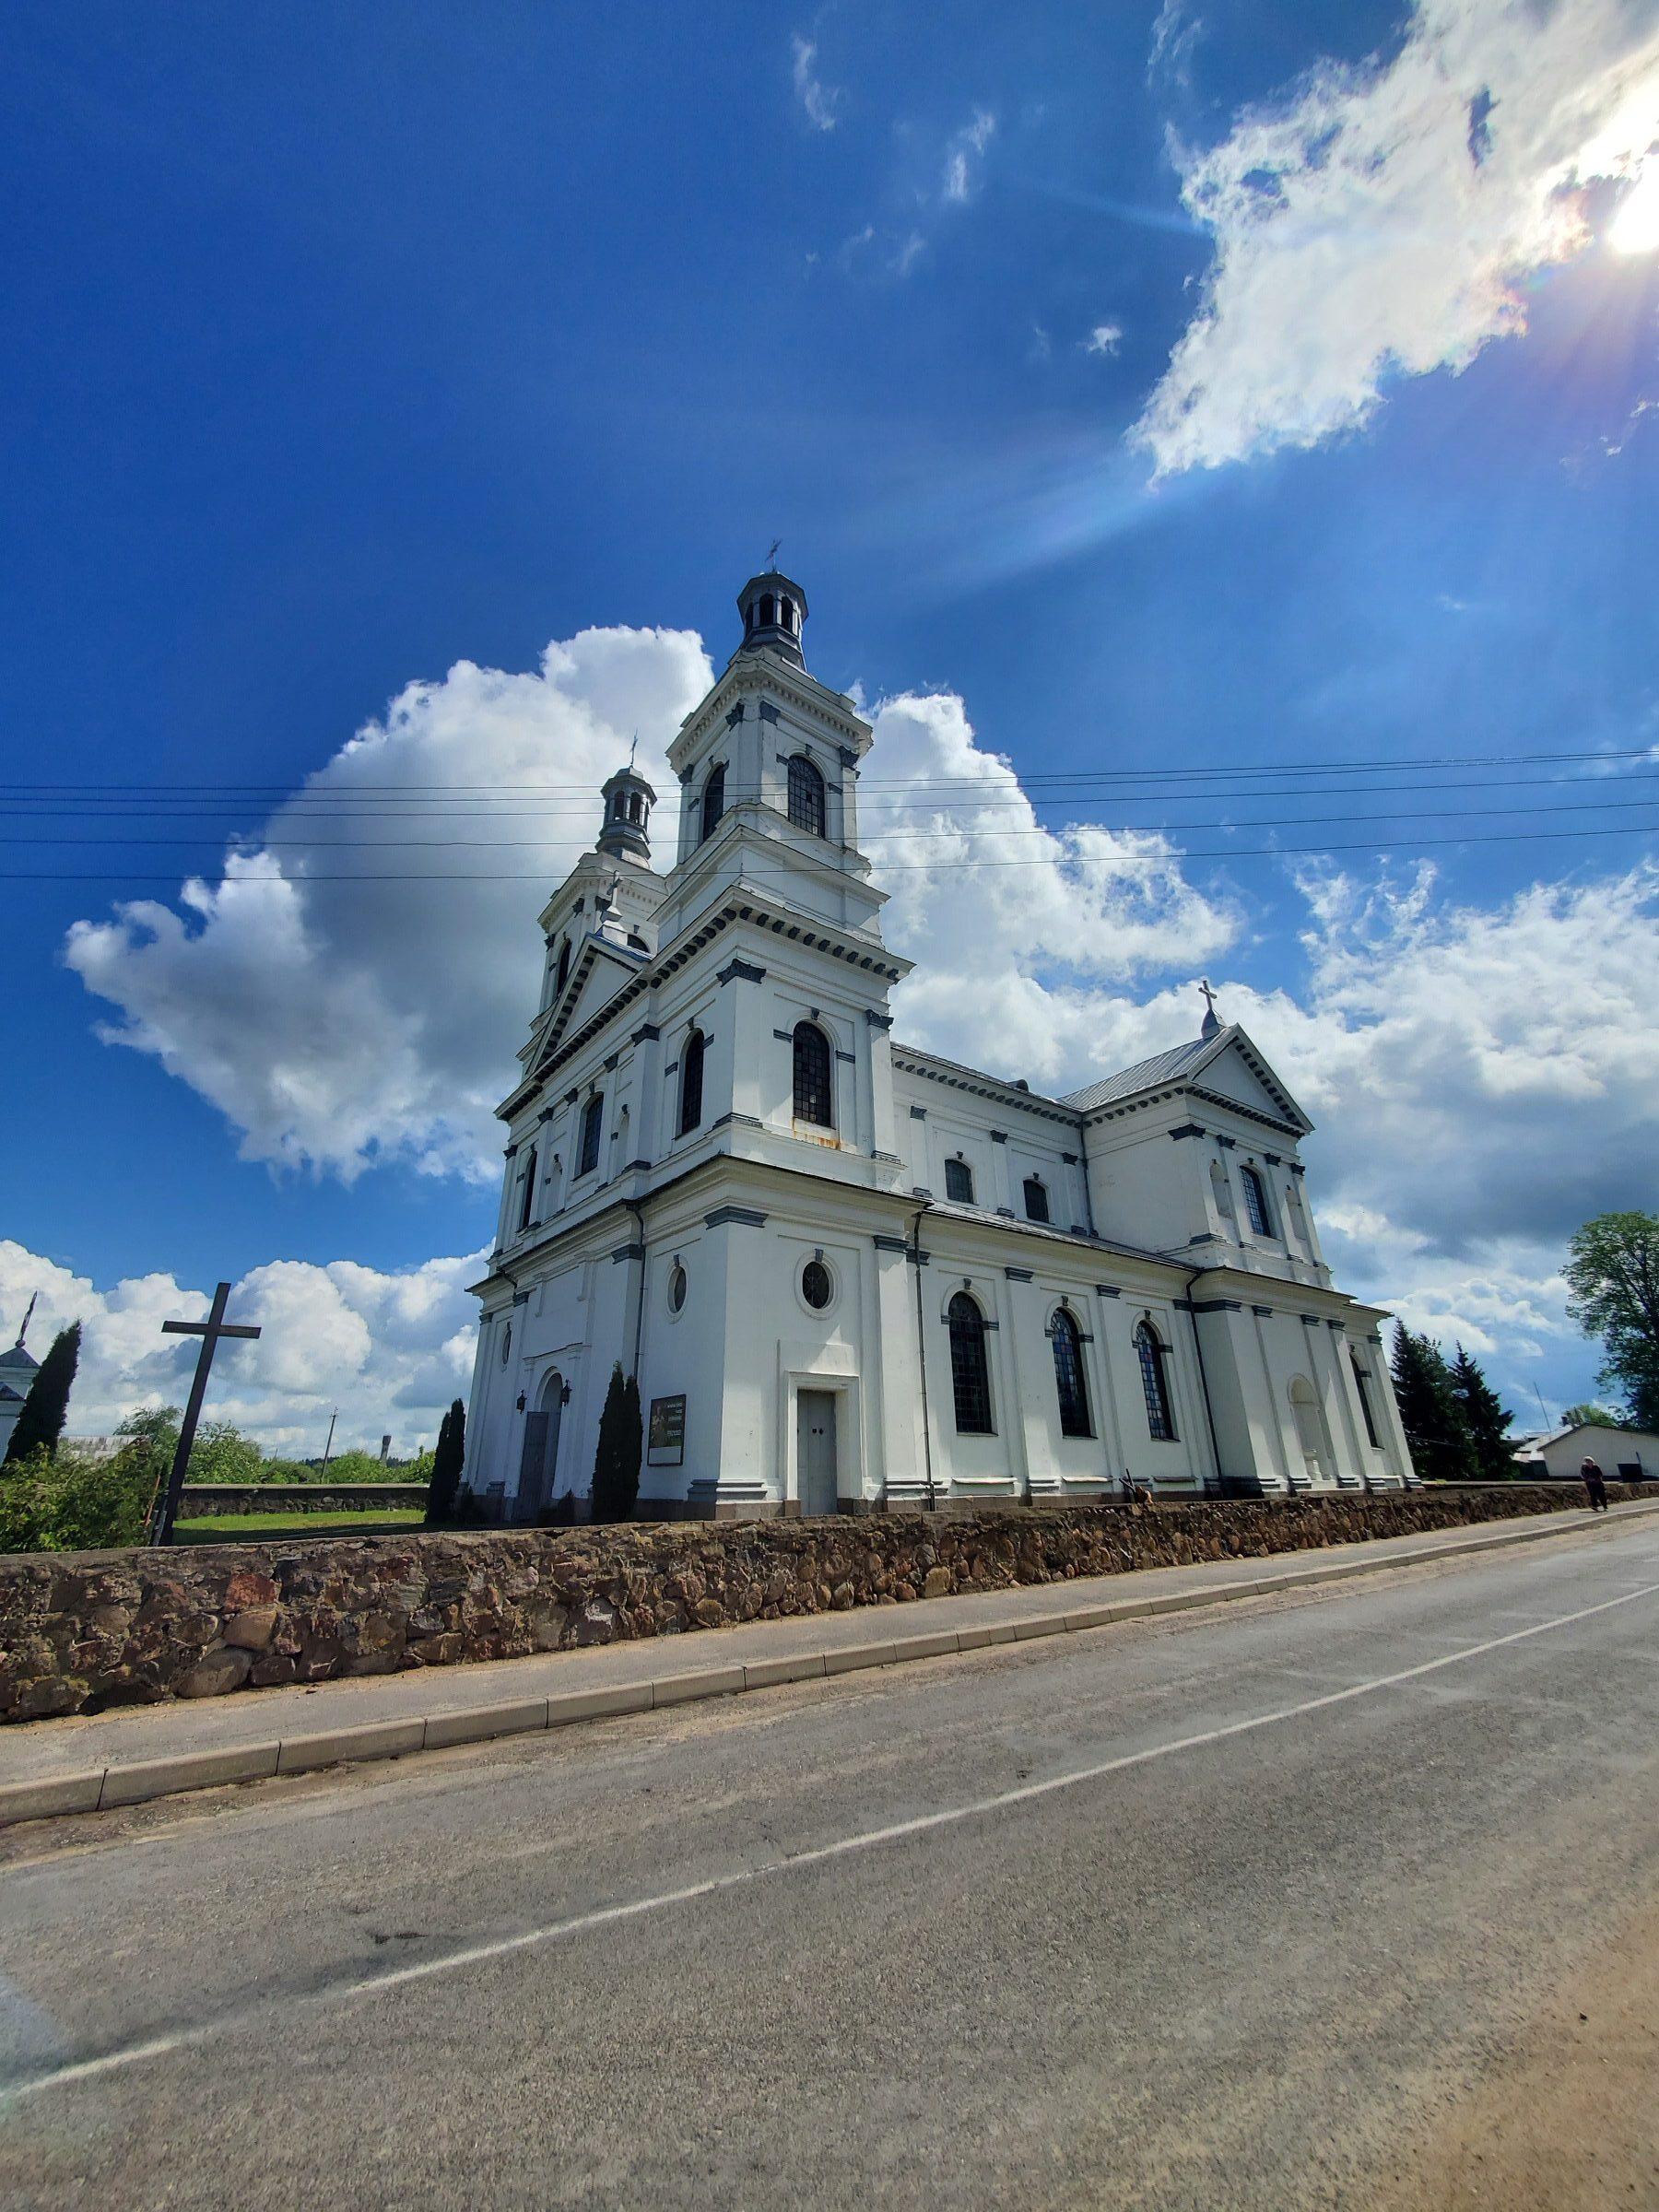 20200606 110719 rotated e1605867633621 - Церковь Святого Георгия Победоносца в Ситцах